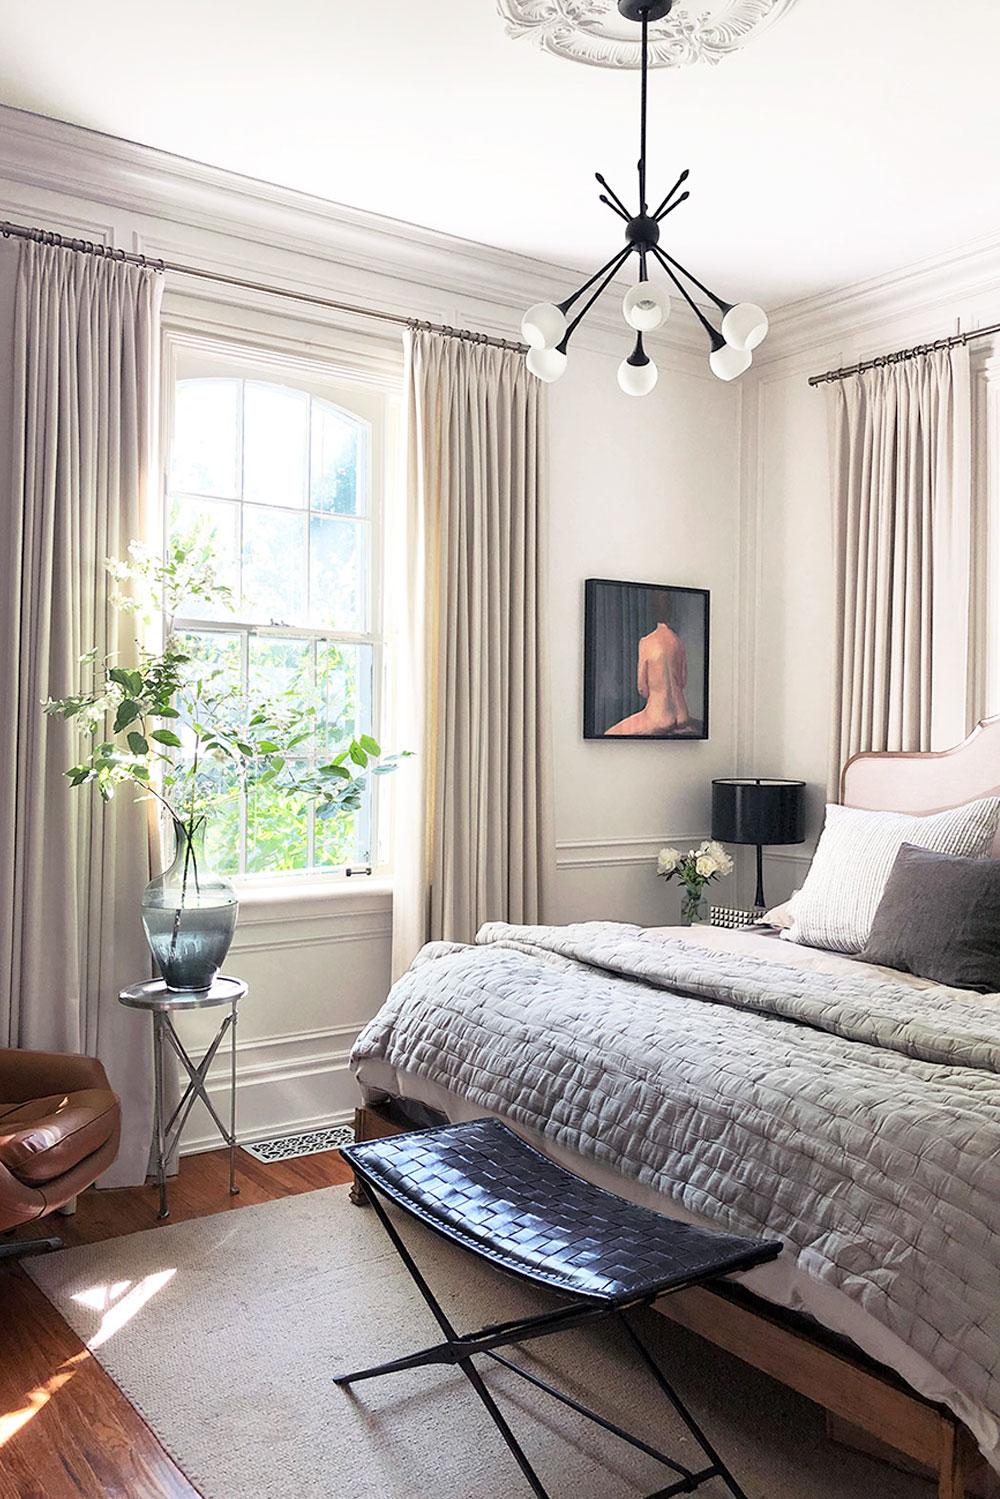 Ex-Park-master-bedroom-design